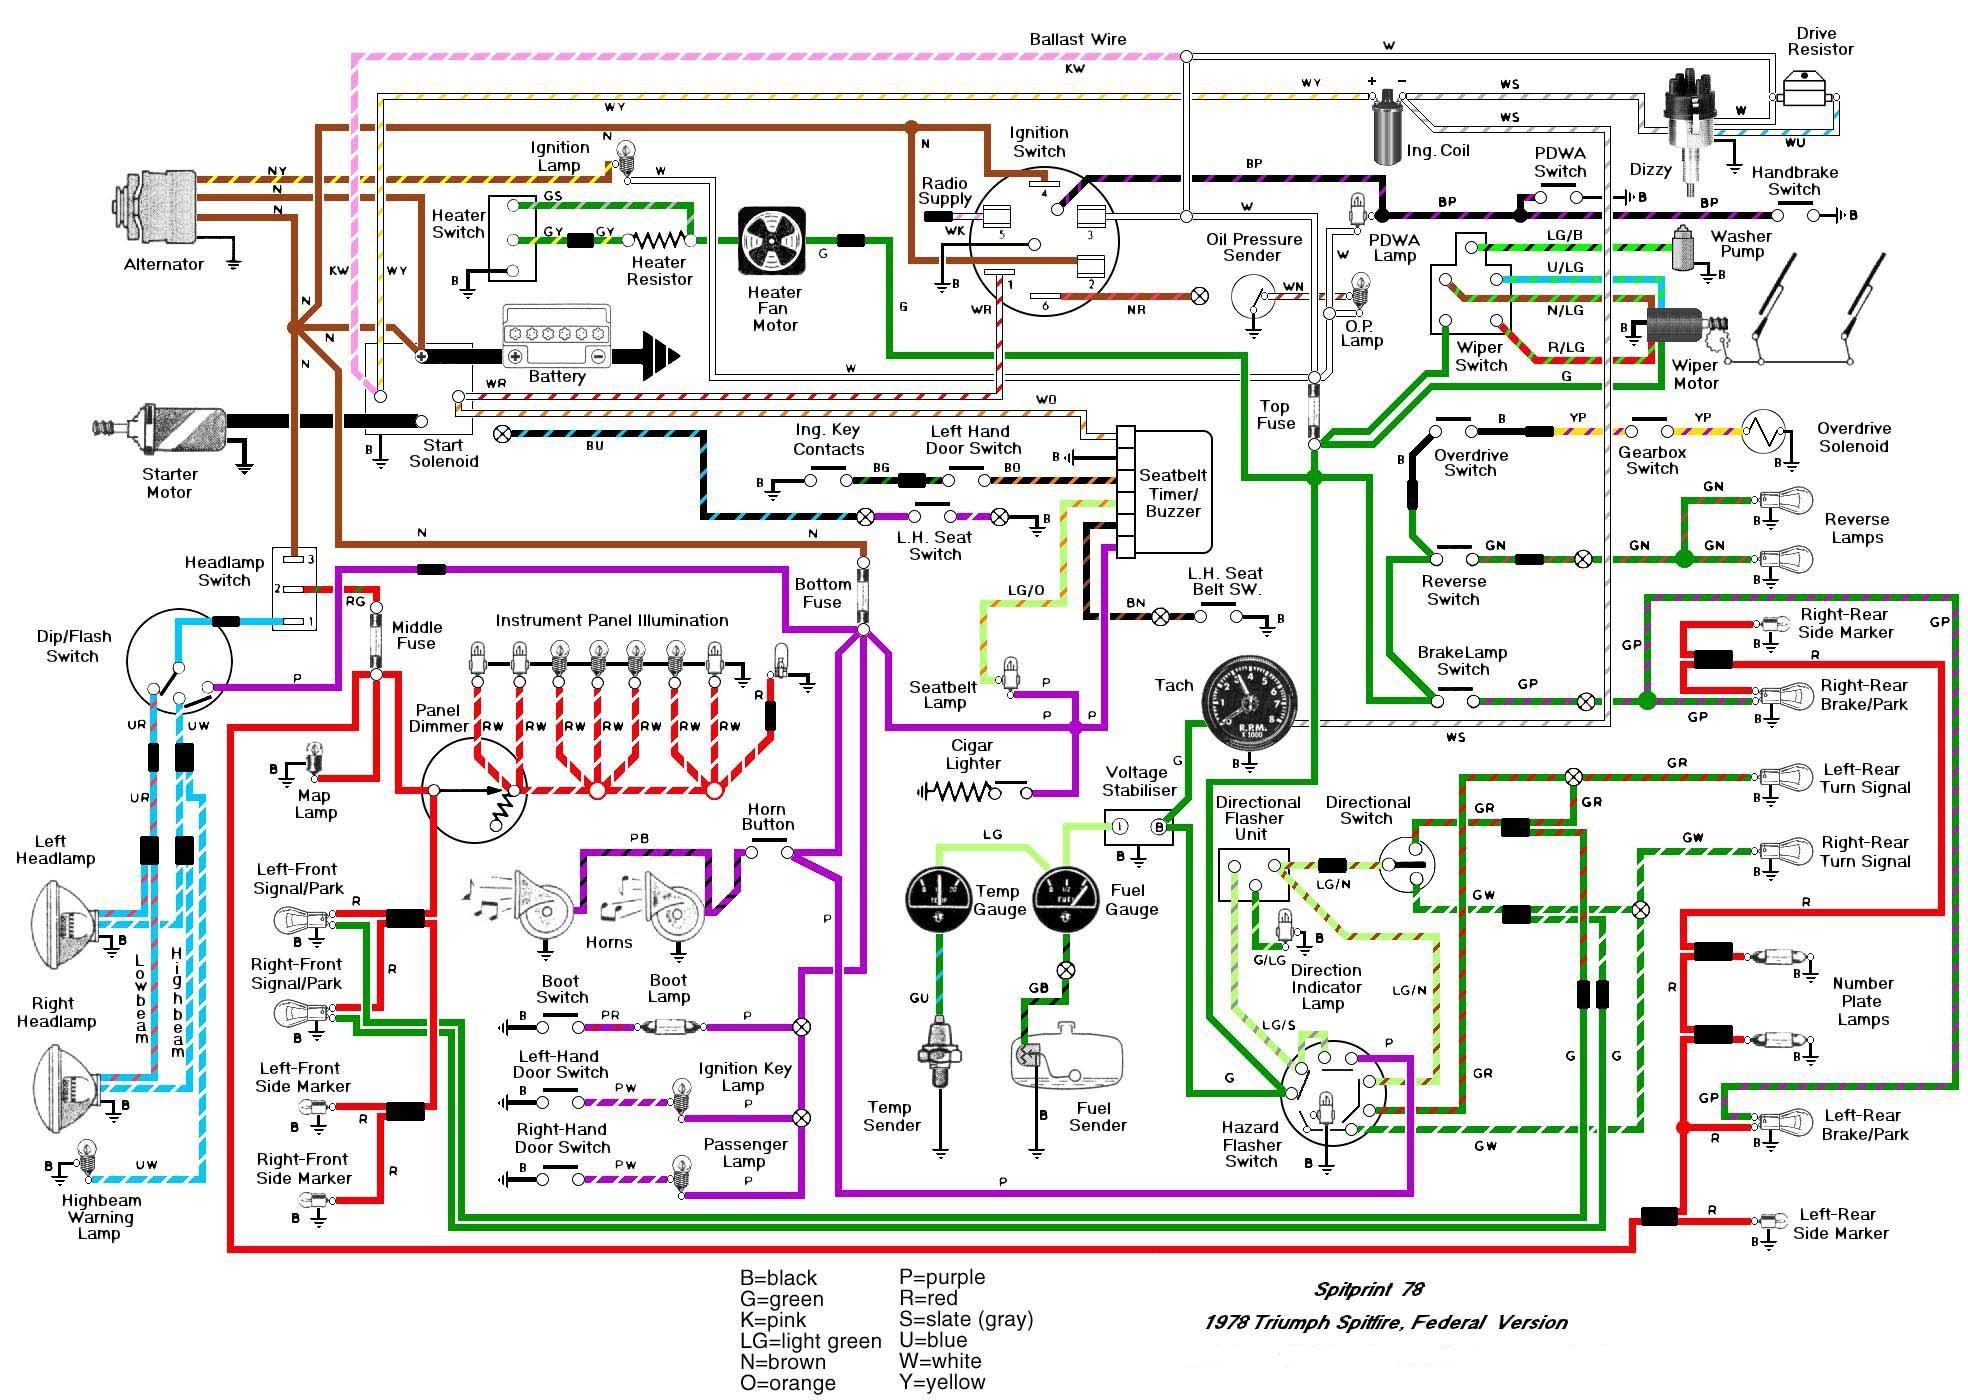 Underside Of Car Diagram Automobile Wiring Diagram Free Download Basic Auto Ac Car Wire Of Underside Of Car Diagram